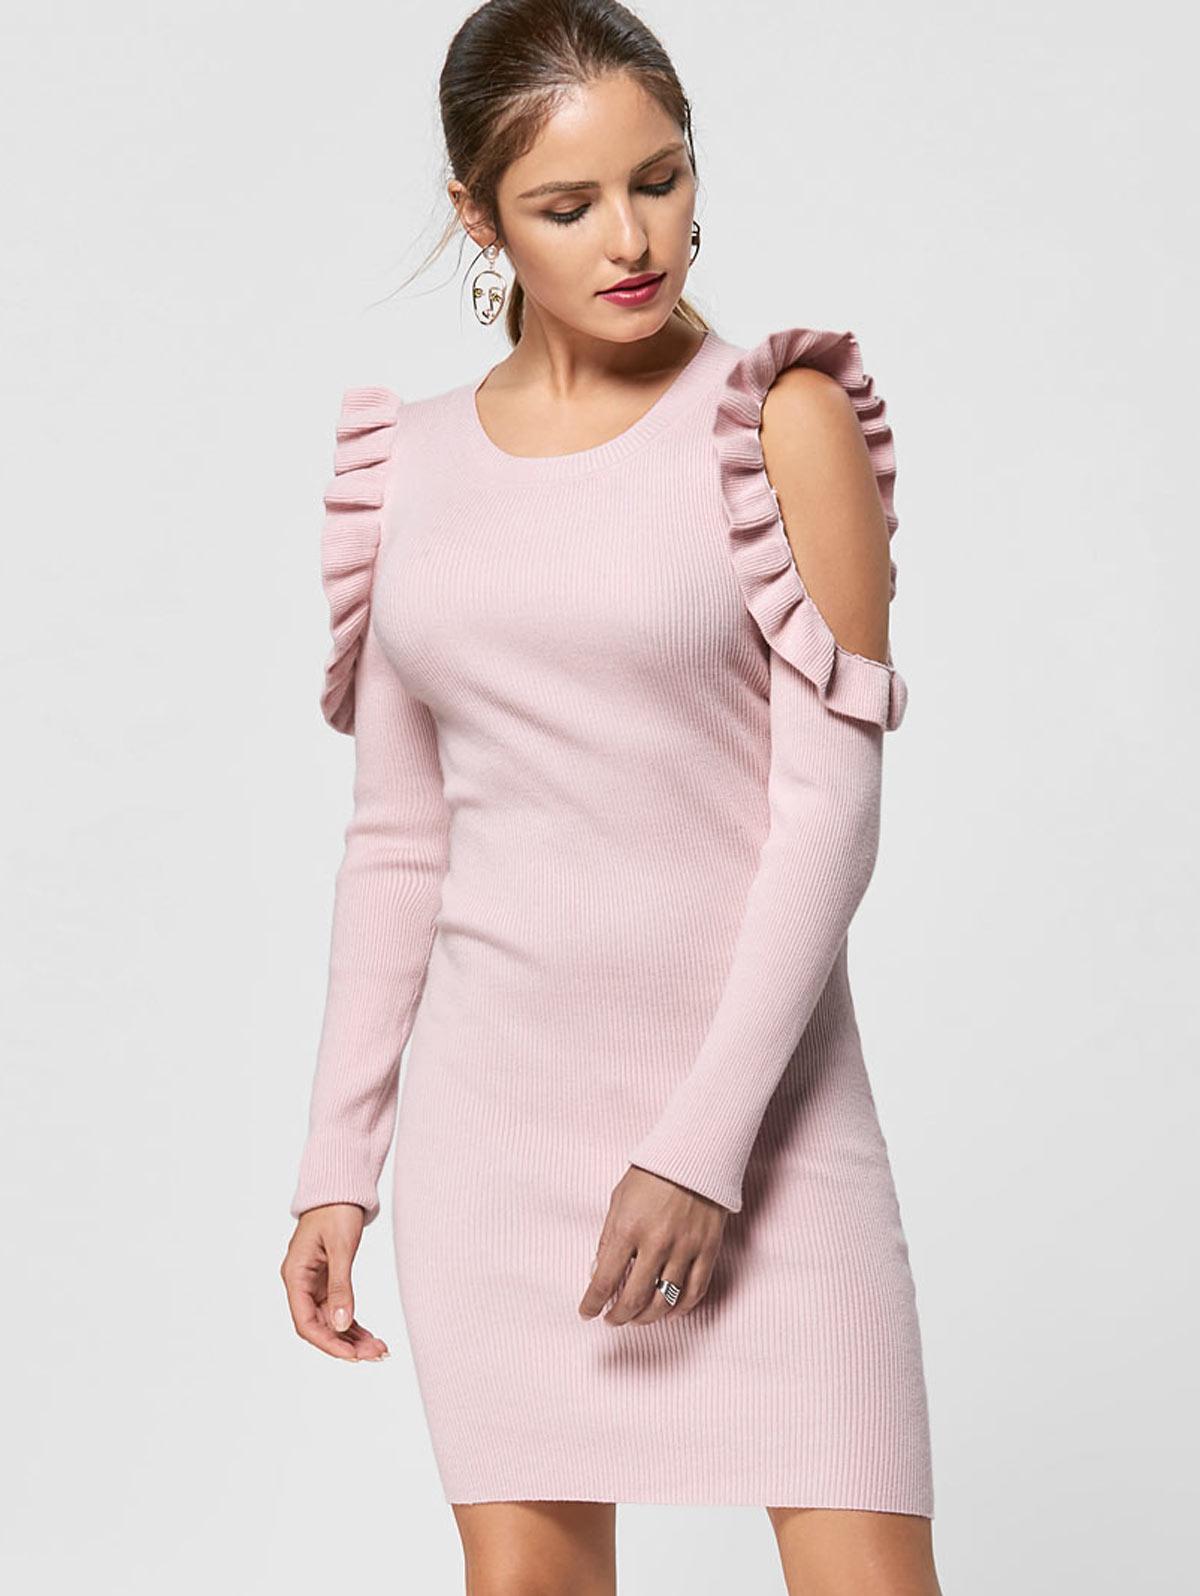 Kenancy Women Ruffle Trim Cold Shoulder Jumper Dress O Neck Full Sleeve Off  Shoulder Knit Sweater Dress Slim Bodycon Dress e93c3a94b9a3